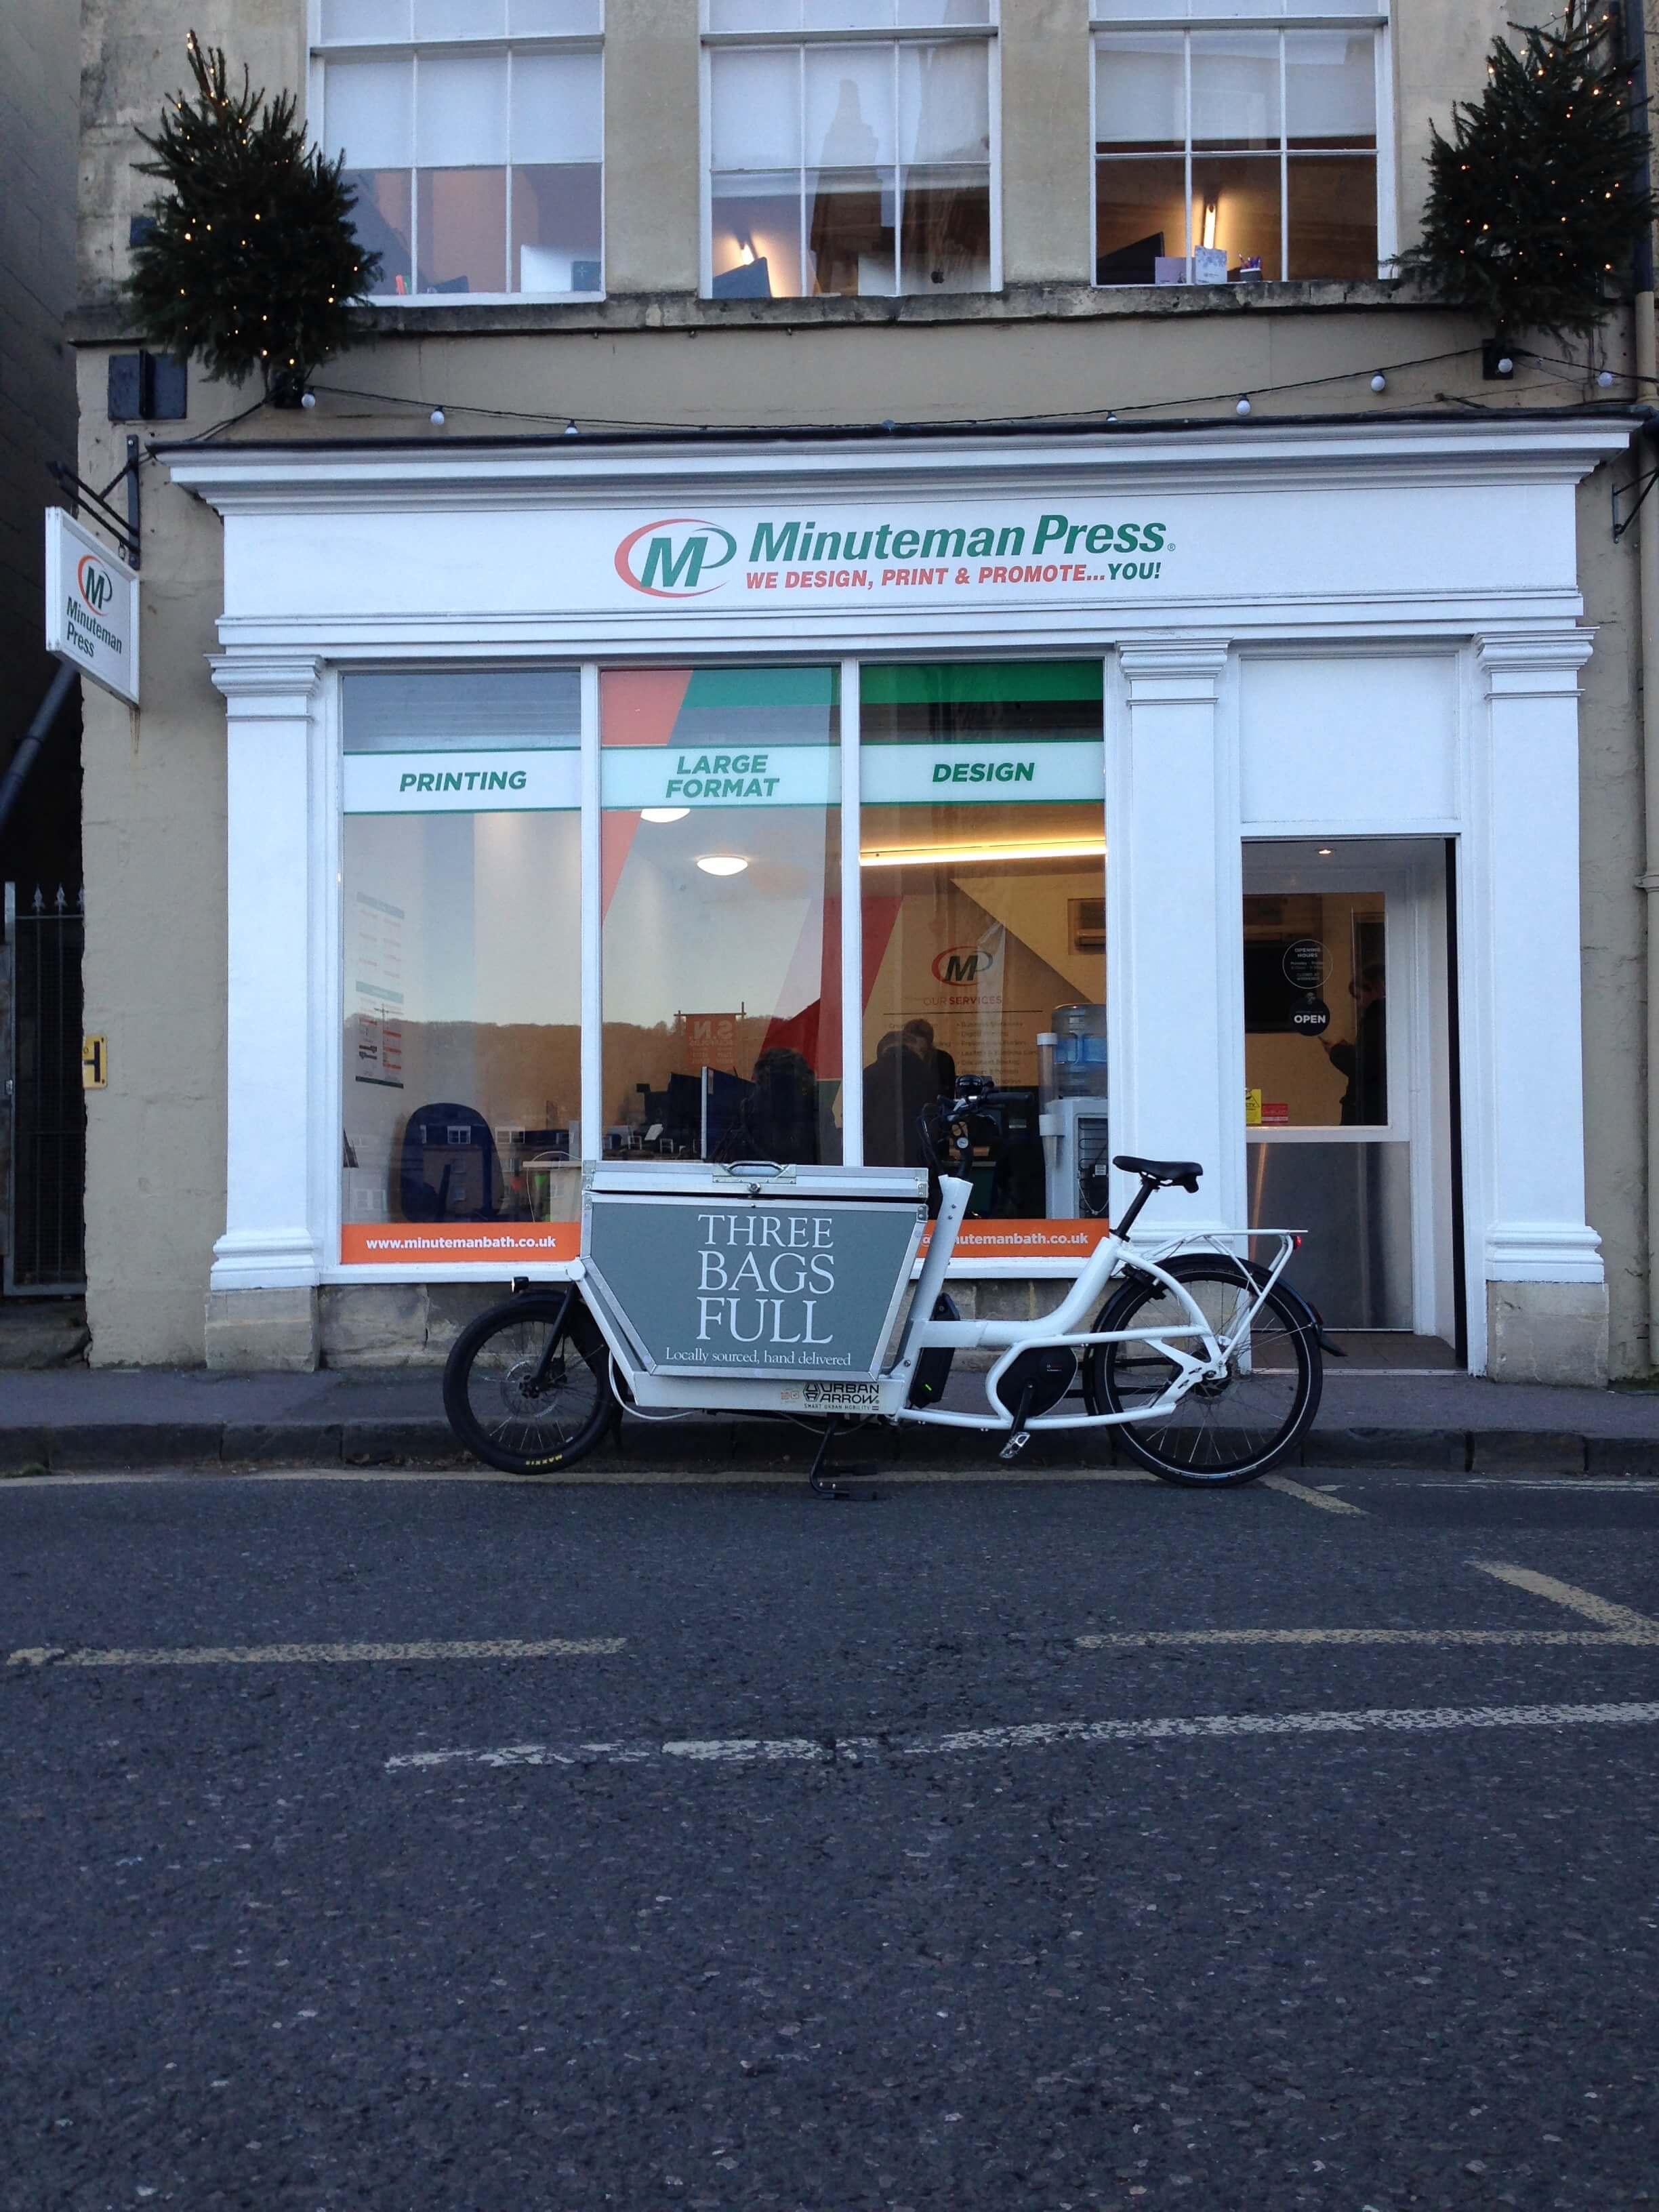 A very regular sight outside Minuteman Press in Walcot Street!